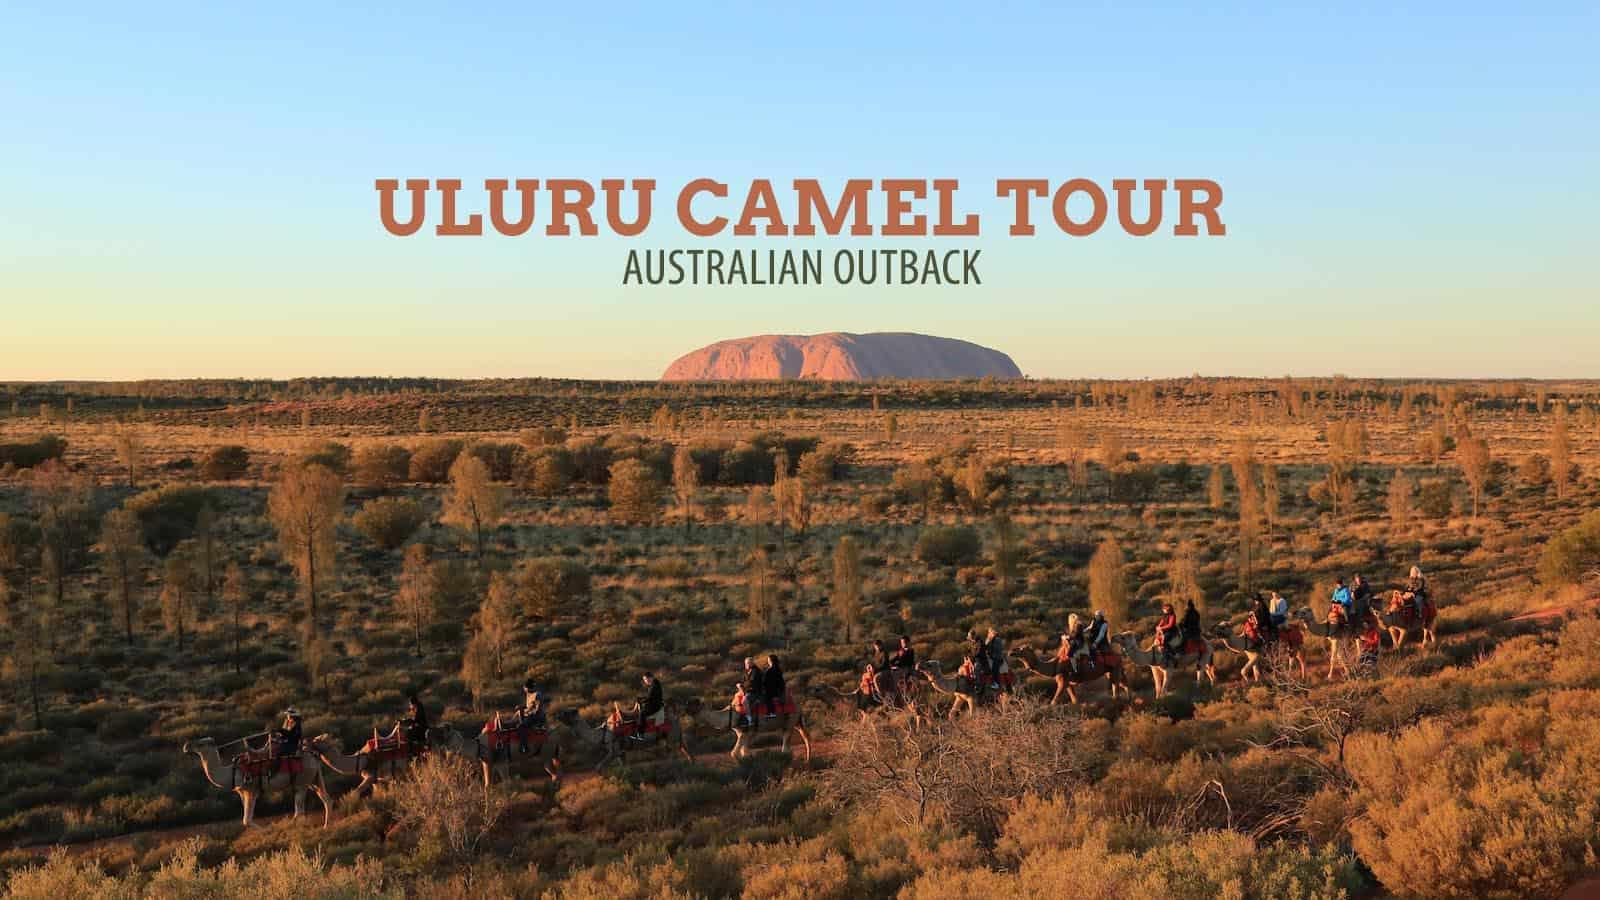 Australian Outback: Uluru Camel Tour at Sunrise